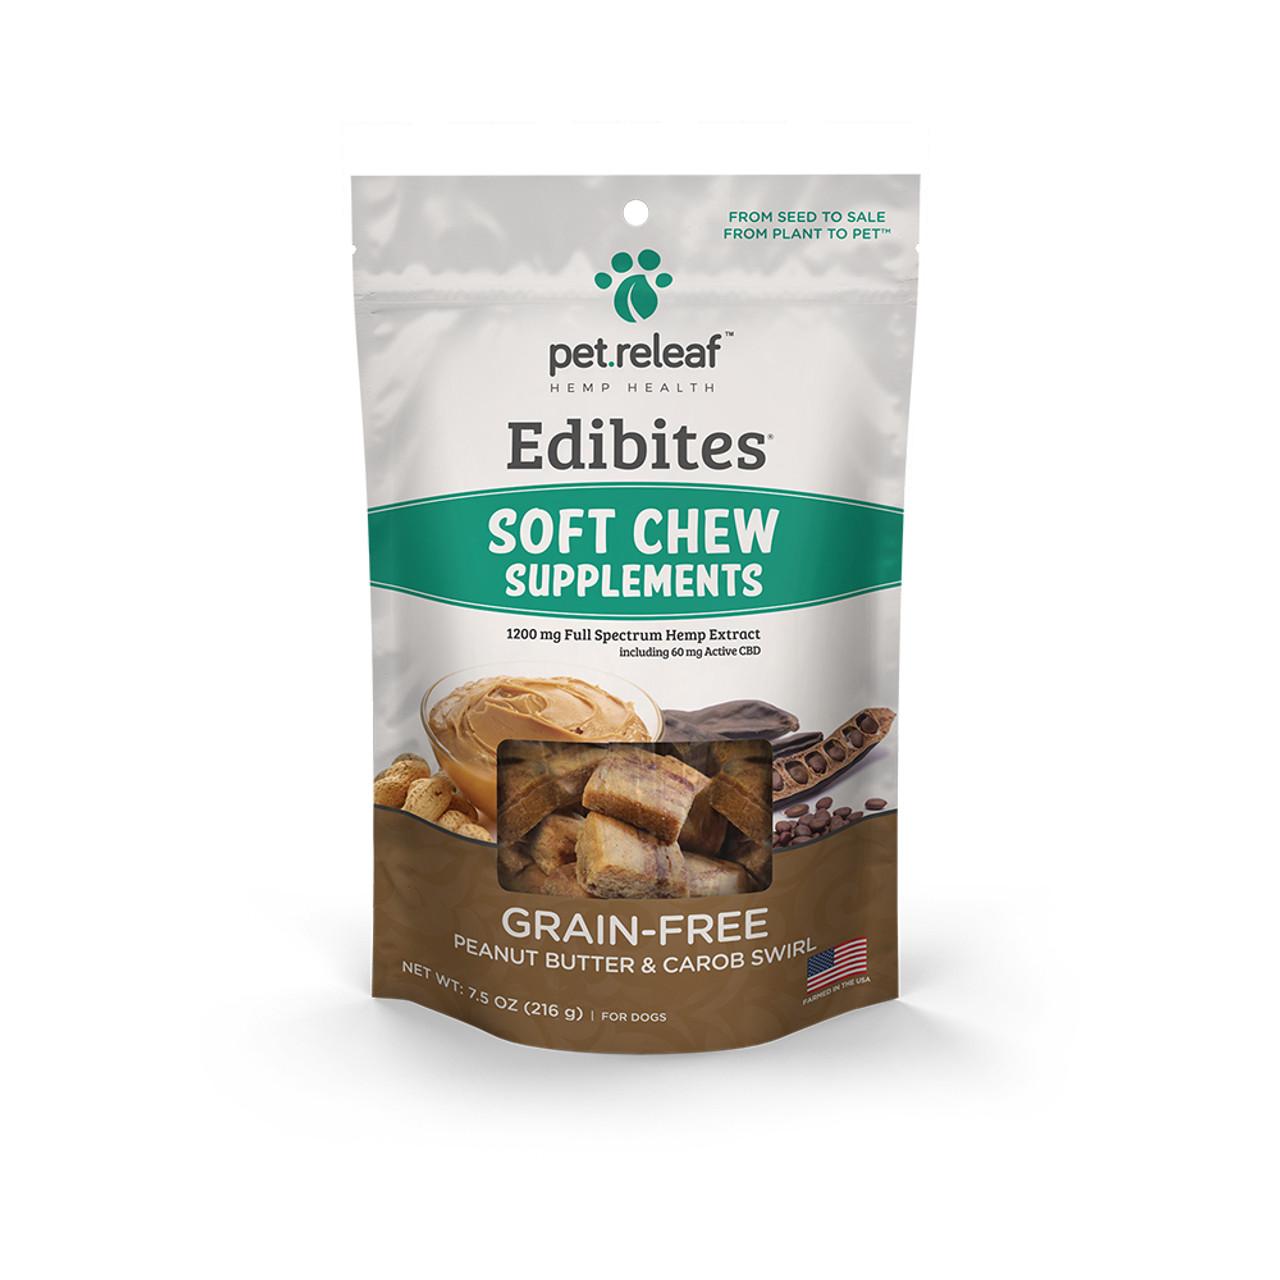 Pet Releaf Edibites Peanut Butter & Carob Swirl Soft Chew Hemp Dog Supplements